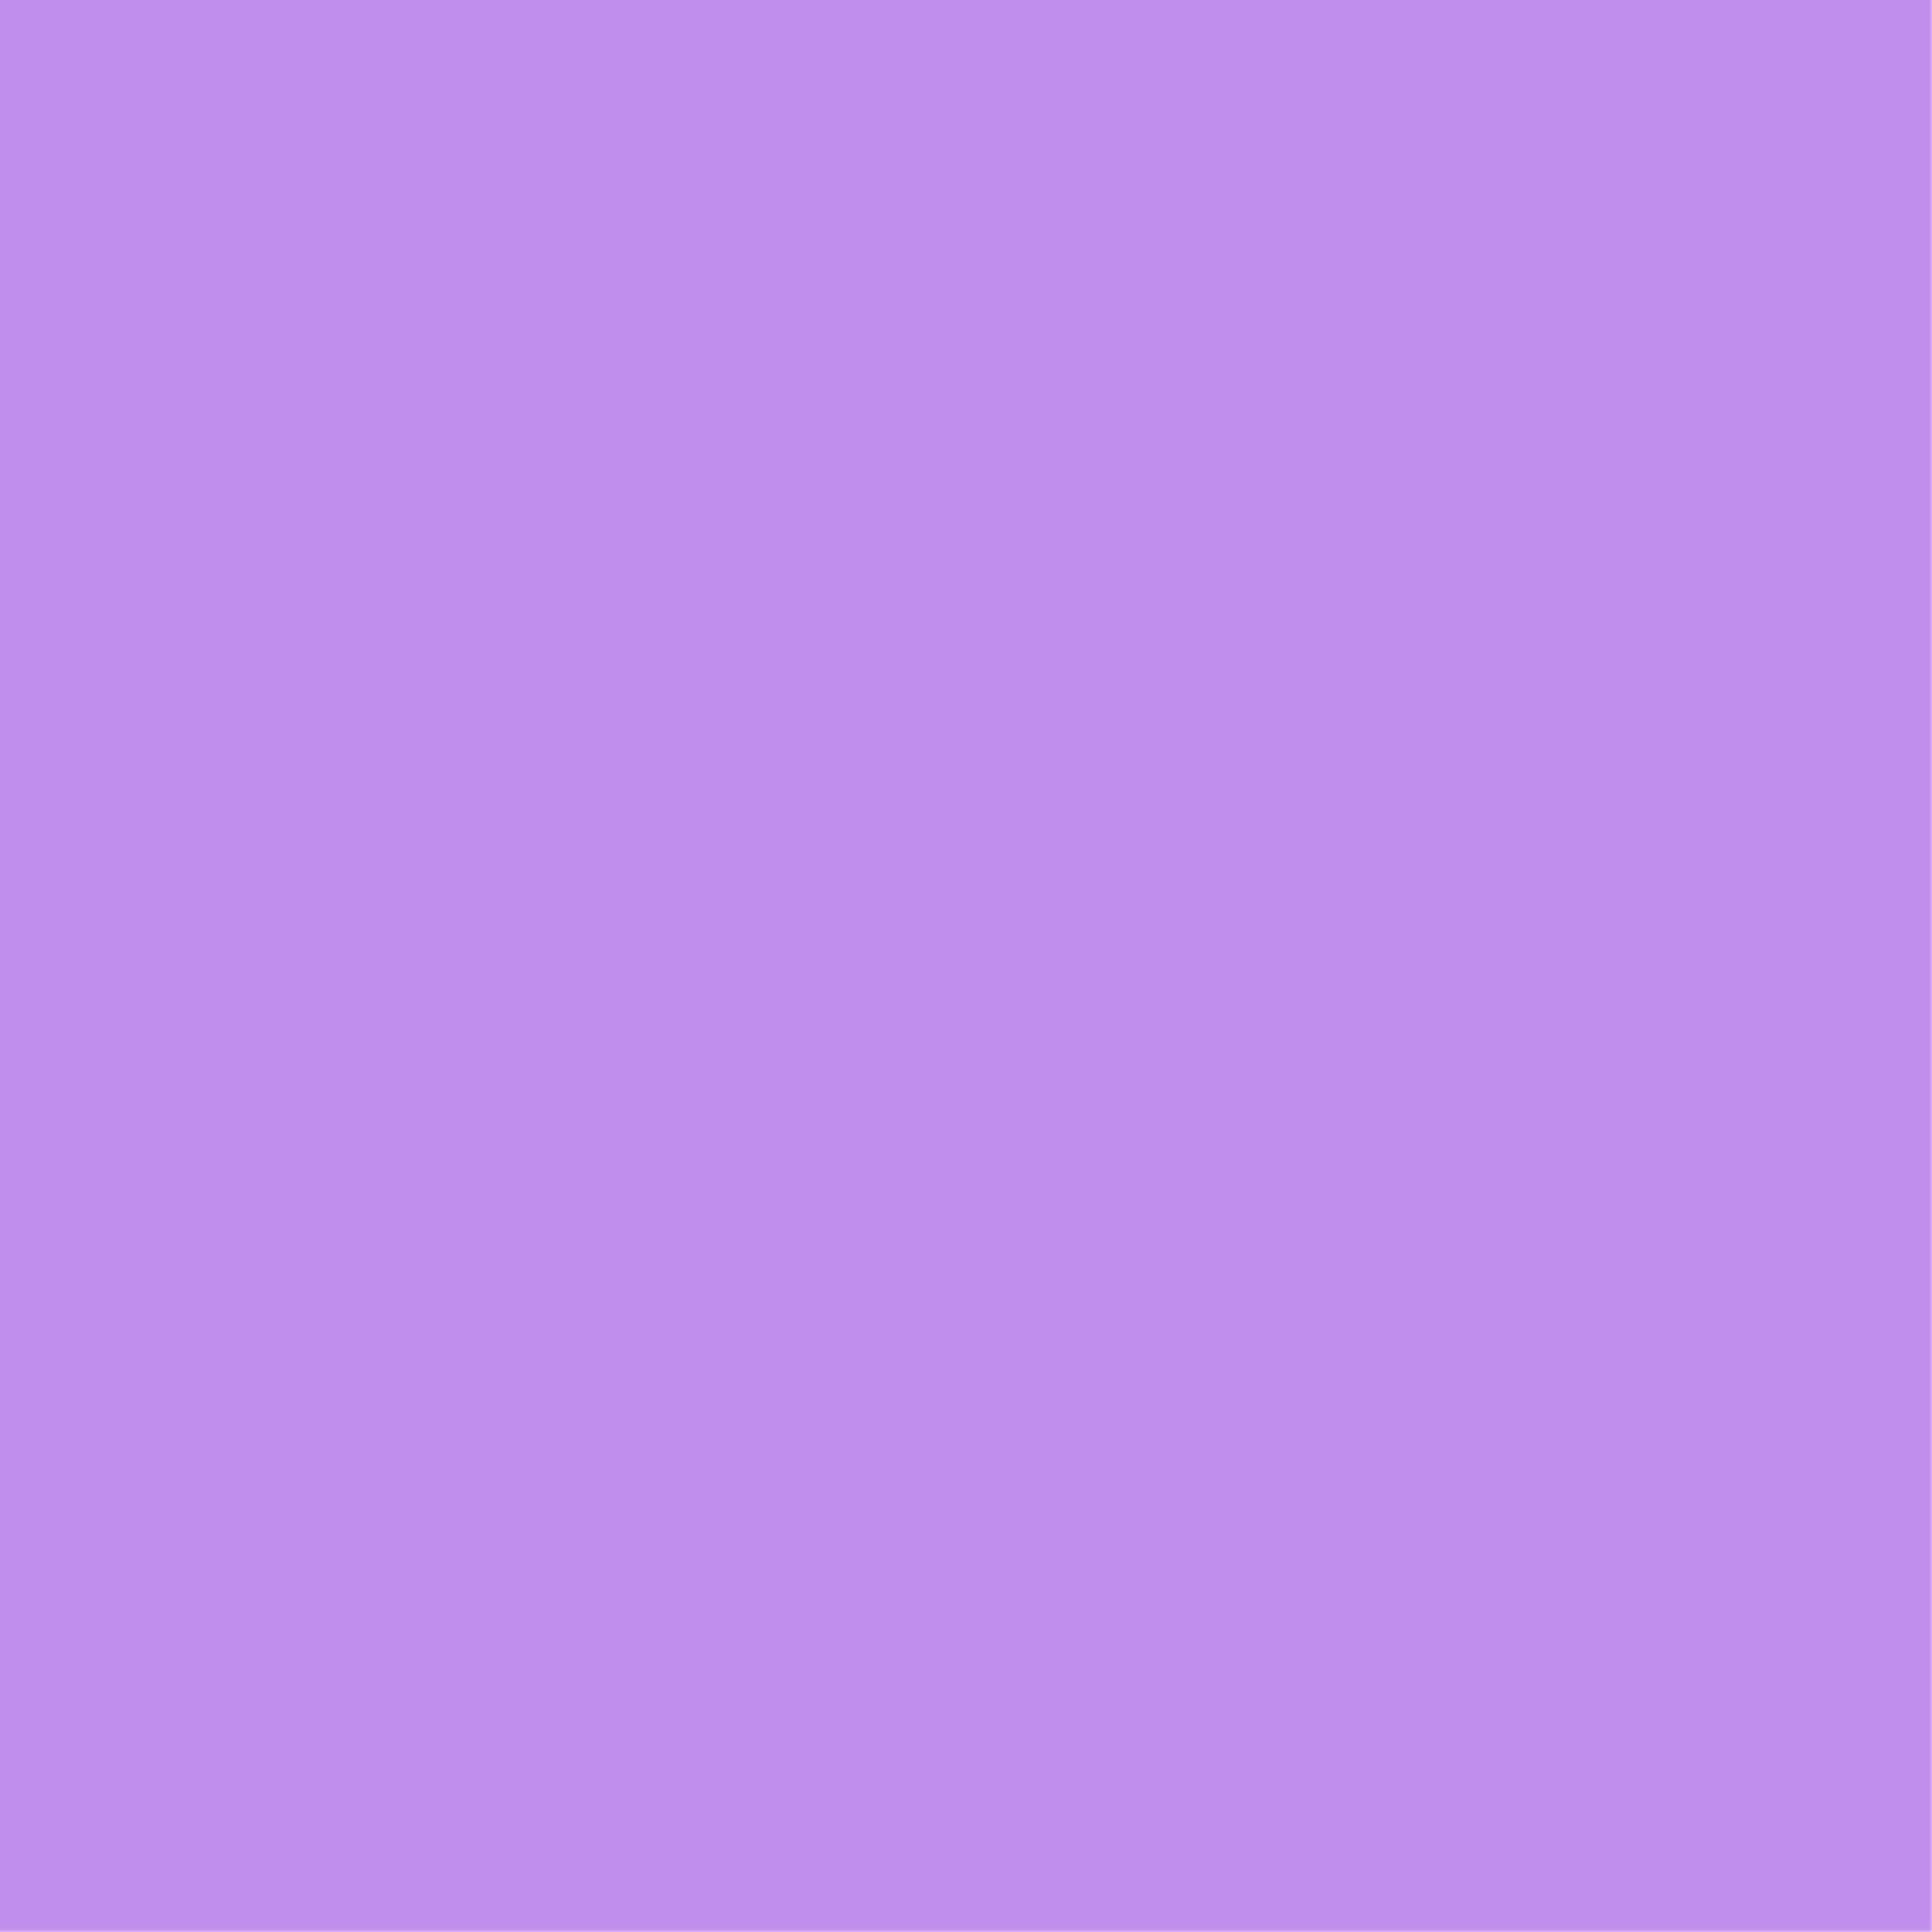 16. Lilac